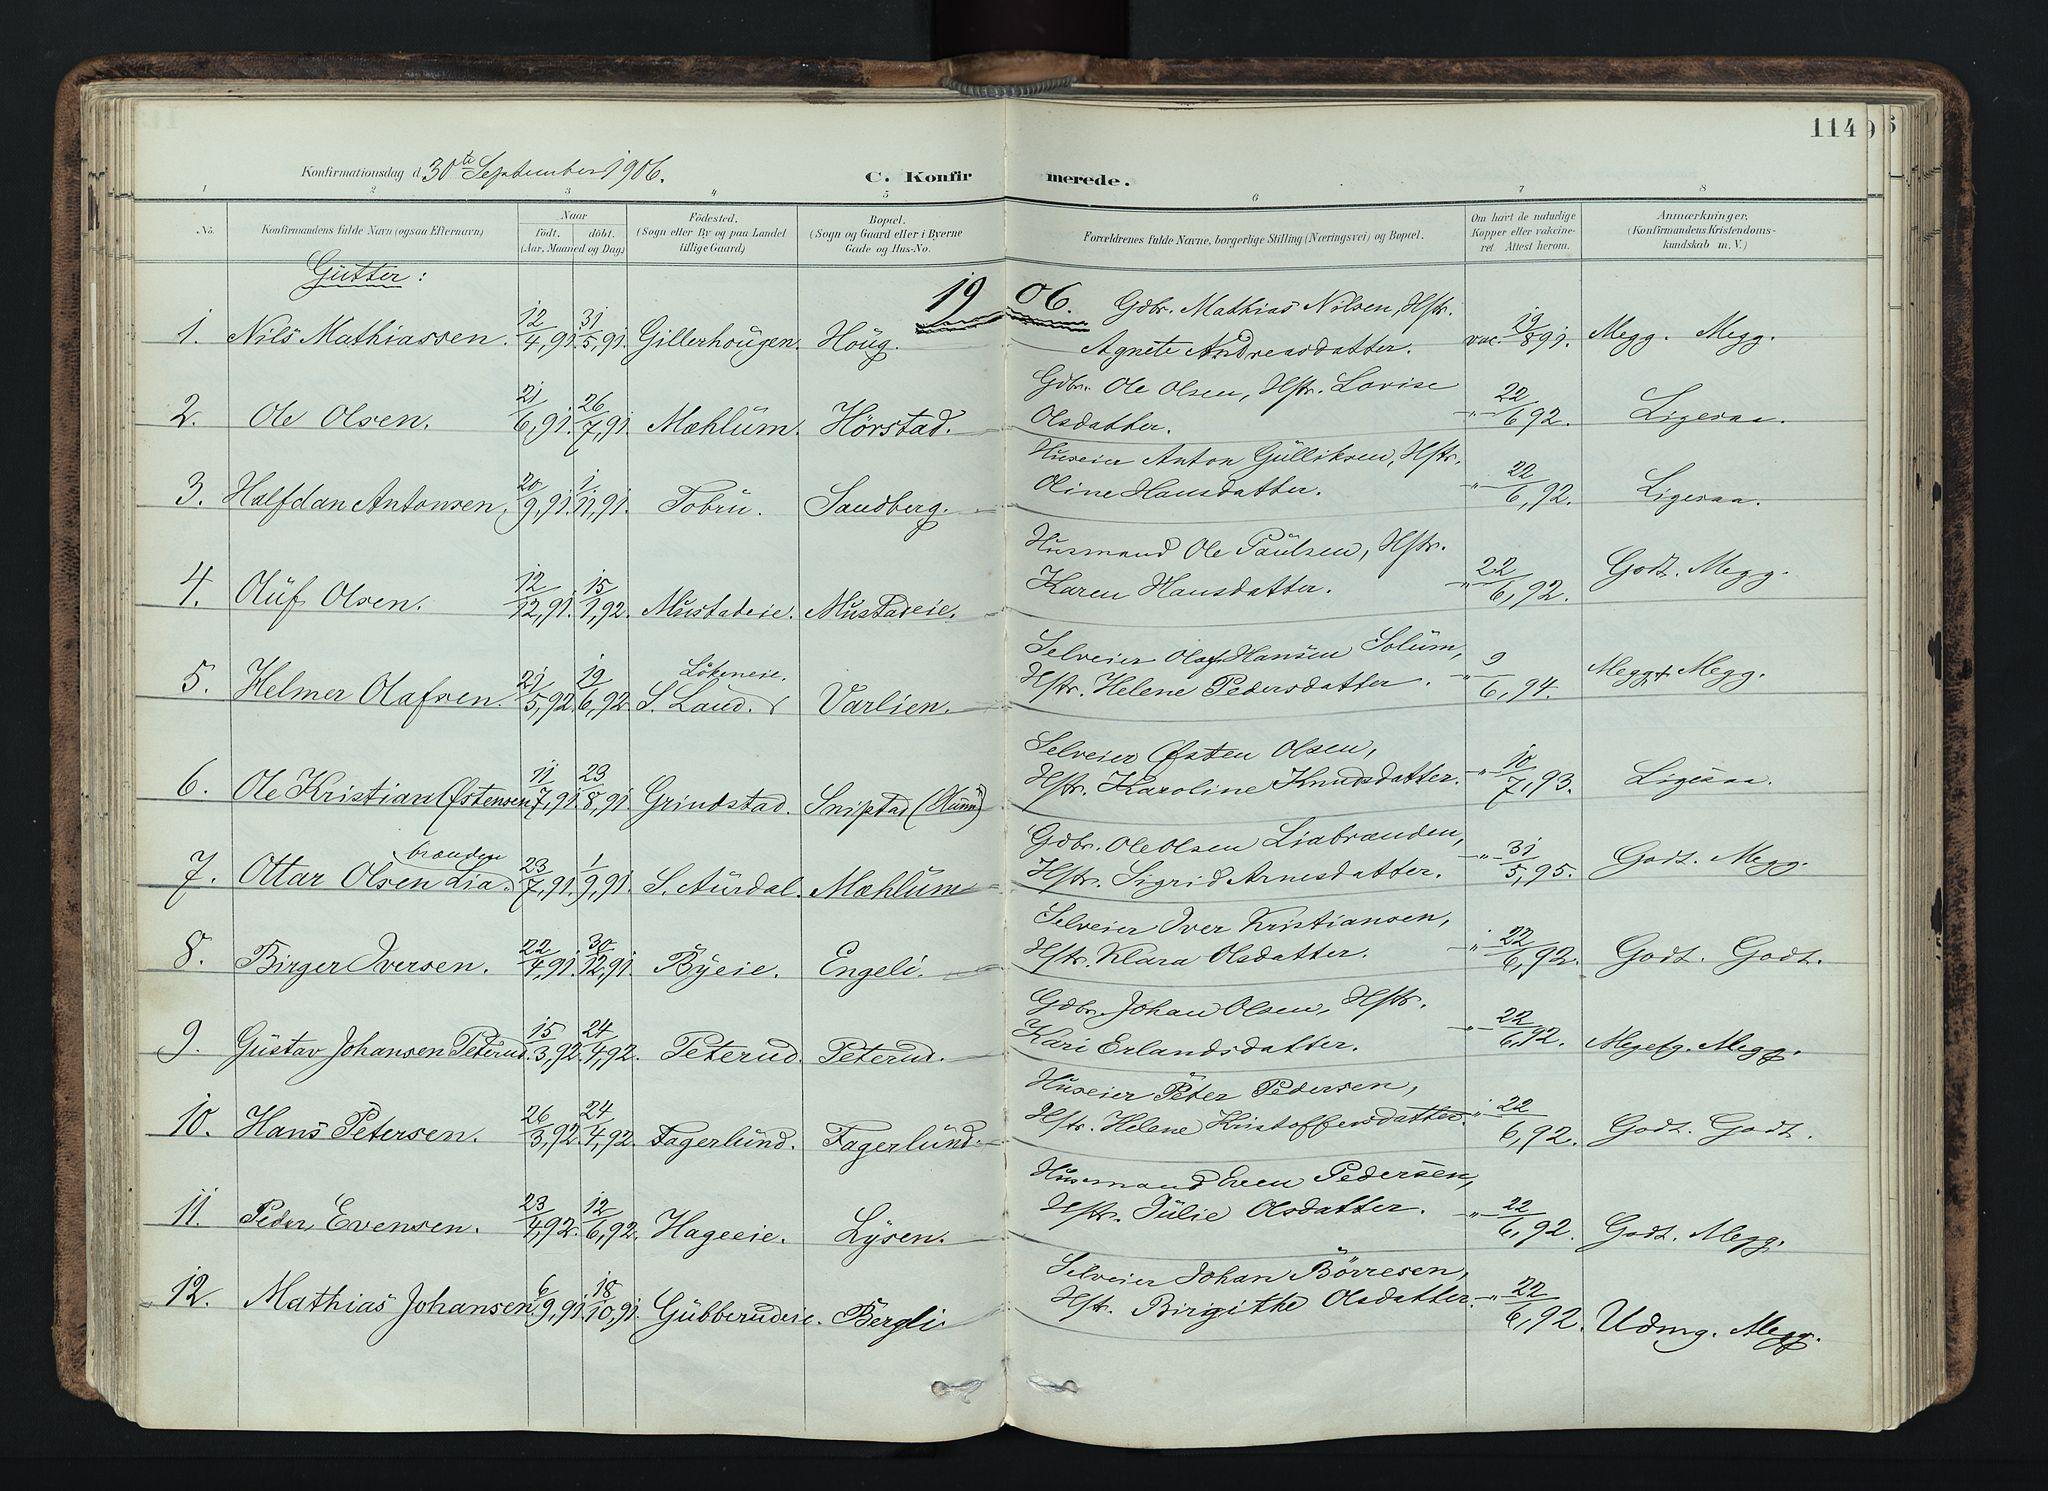 SAH, Vardal prestekontor, H/Ha/Haa/L0019: Ministerialbok nr. 19, 1893-1907, s. 114